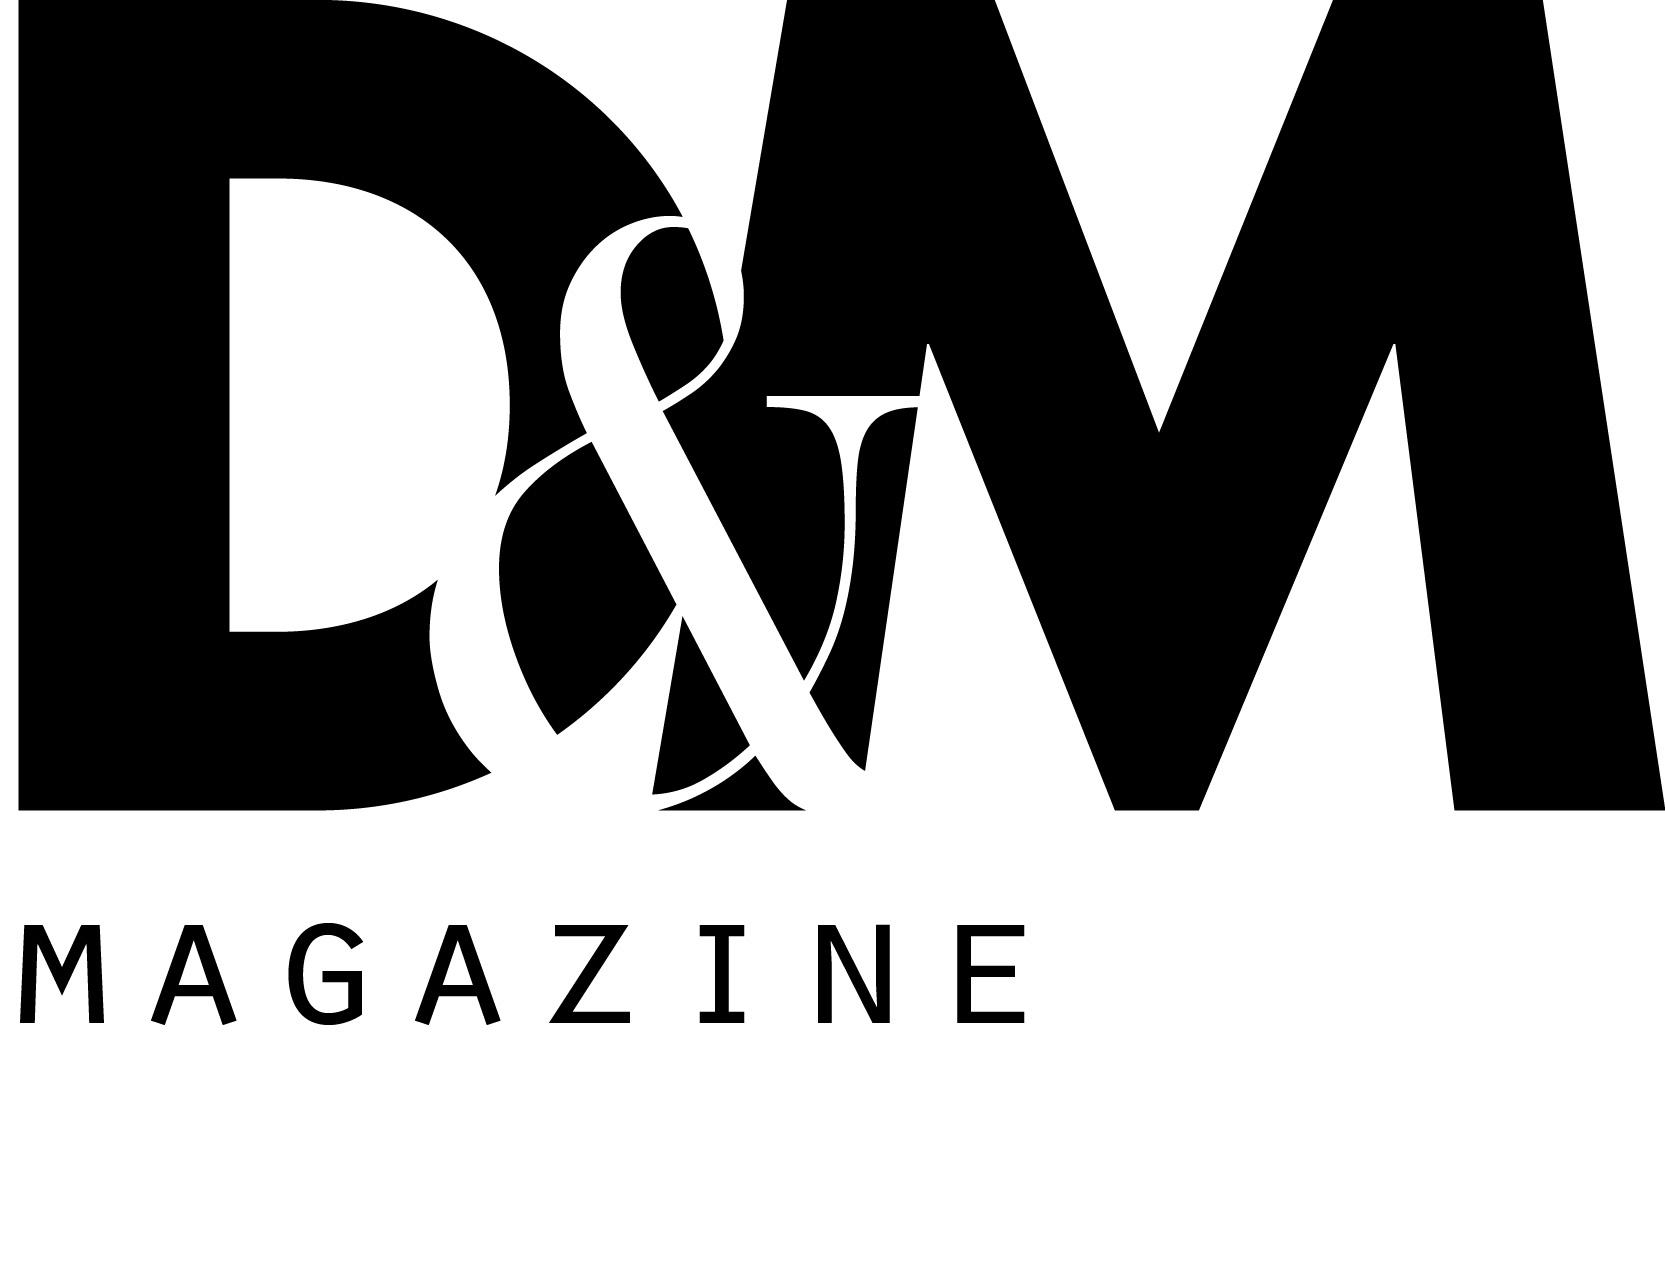 design and merchandising magazine design and merchandising undergraduate drexel westphal. Black Bedroom Furniture Sets. Home Design Ideas